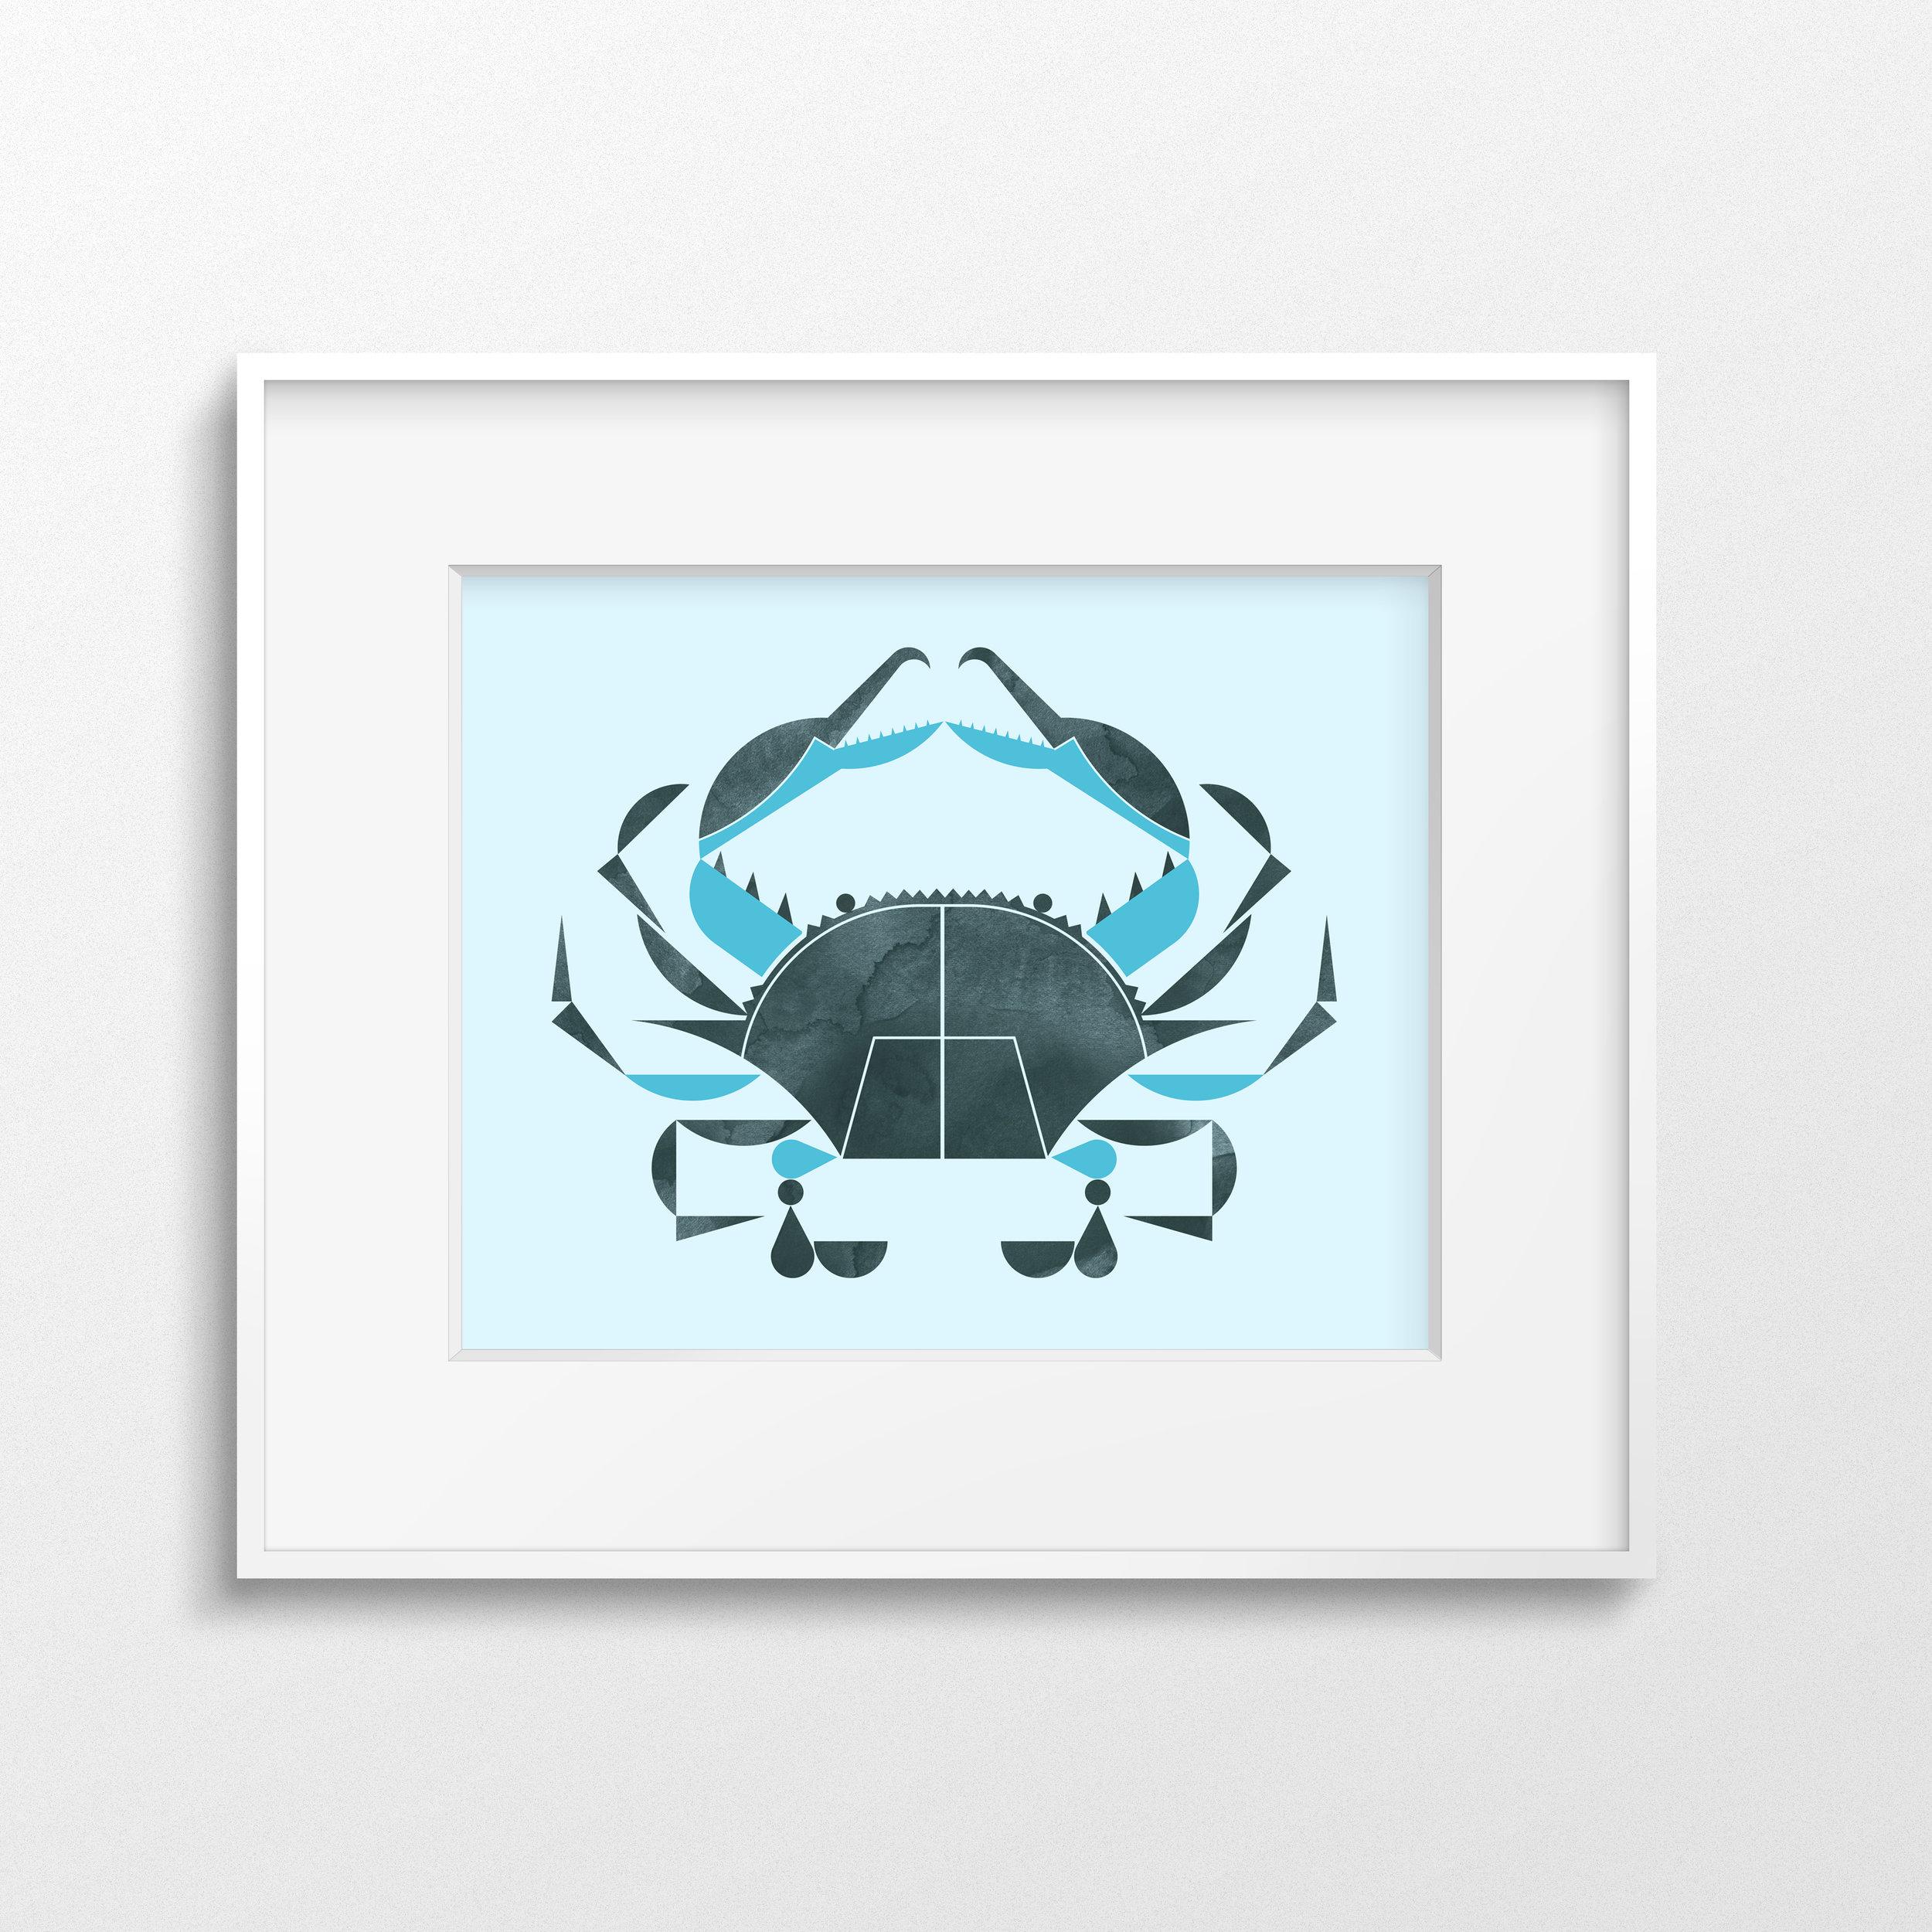 Blue Crab (8x10).jpg